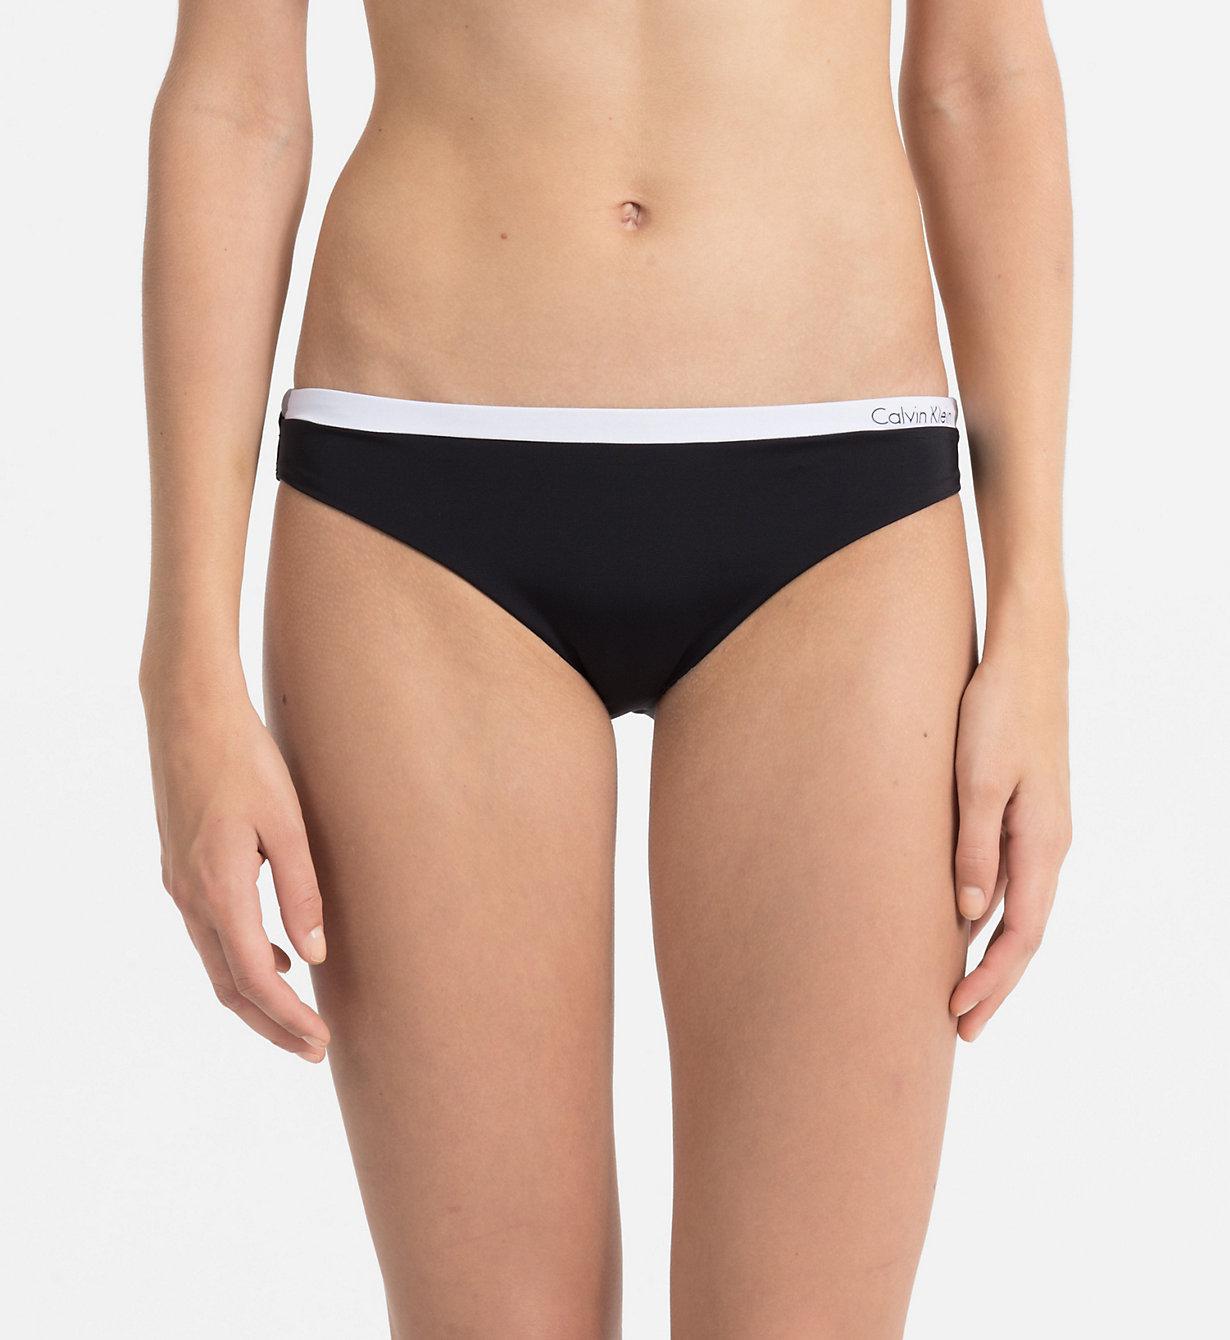 77689aa46d22b Calvin Klein Classic Bikini Bottom - Logotape in Black - Lyst